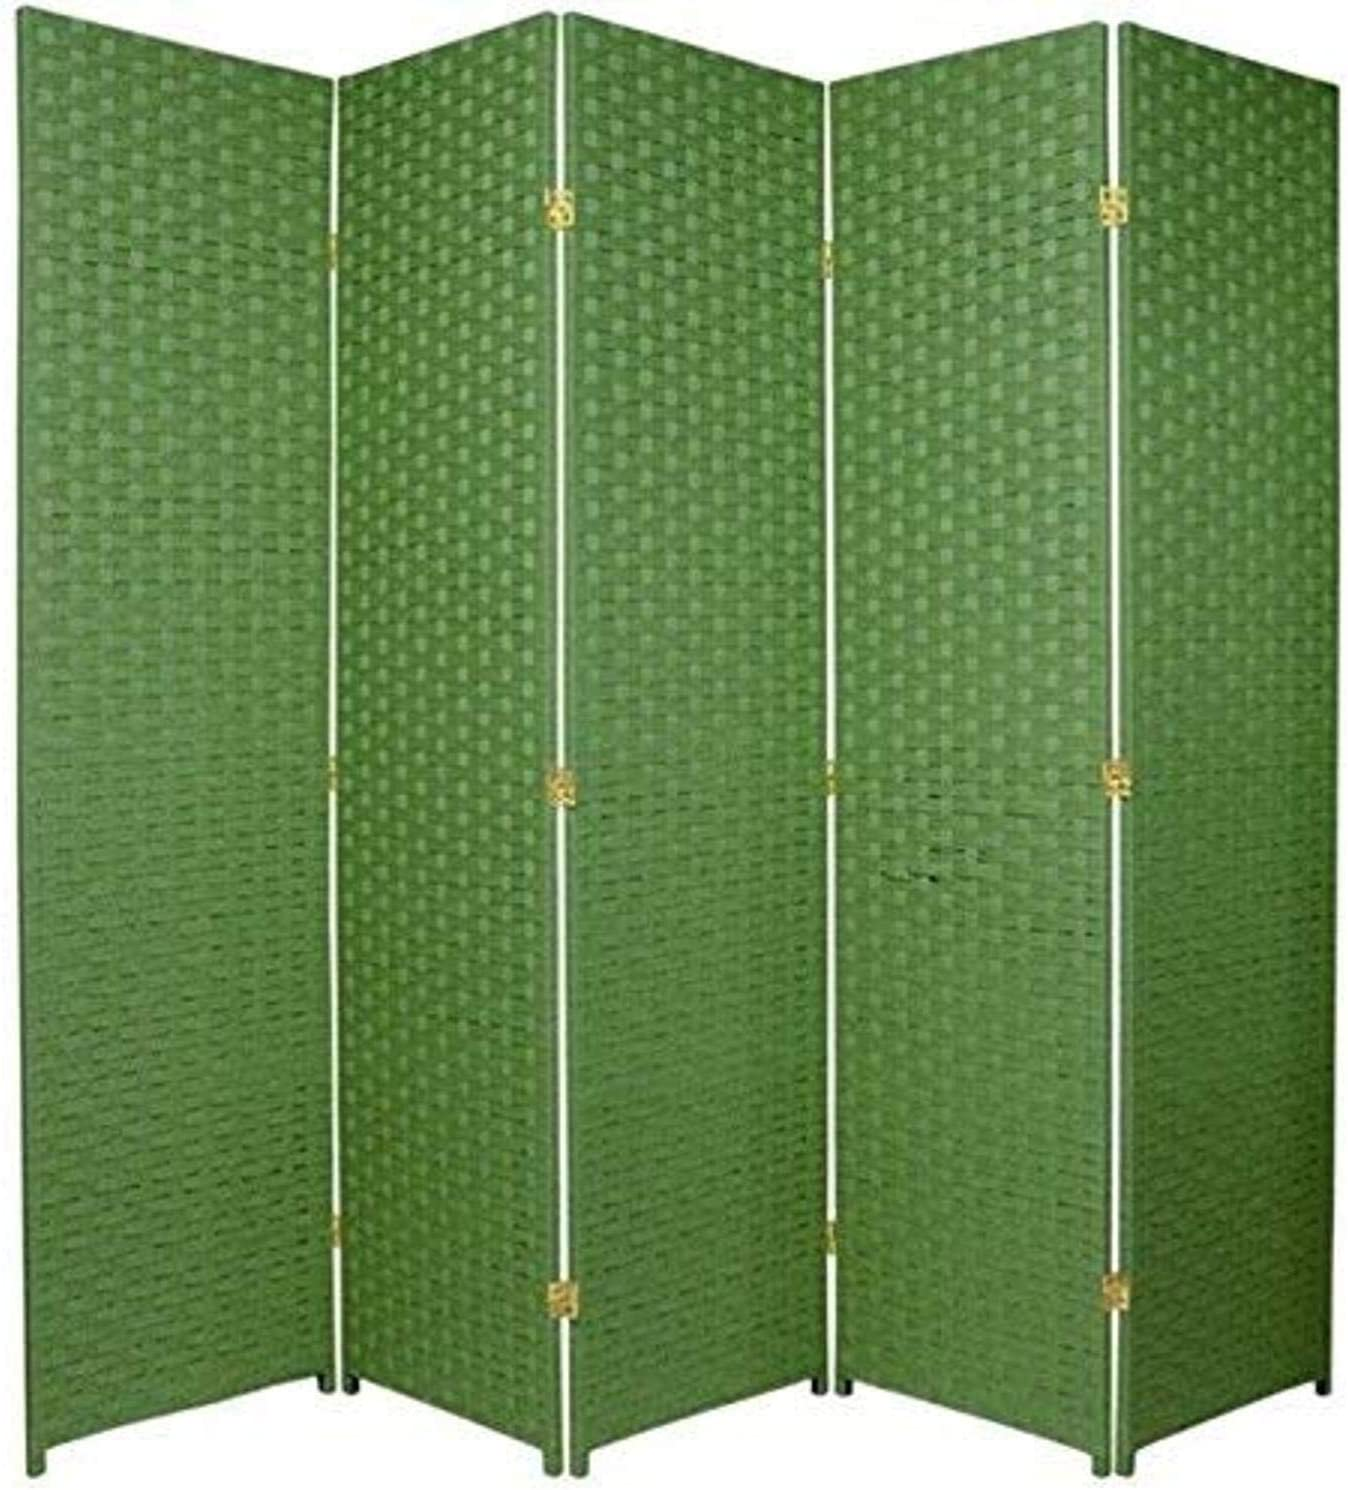 Oriental Furniture 6 ft. Tall Woven Fiber Room Divider - 5 Panel - Light Green